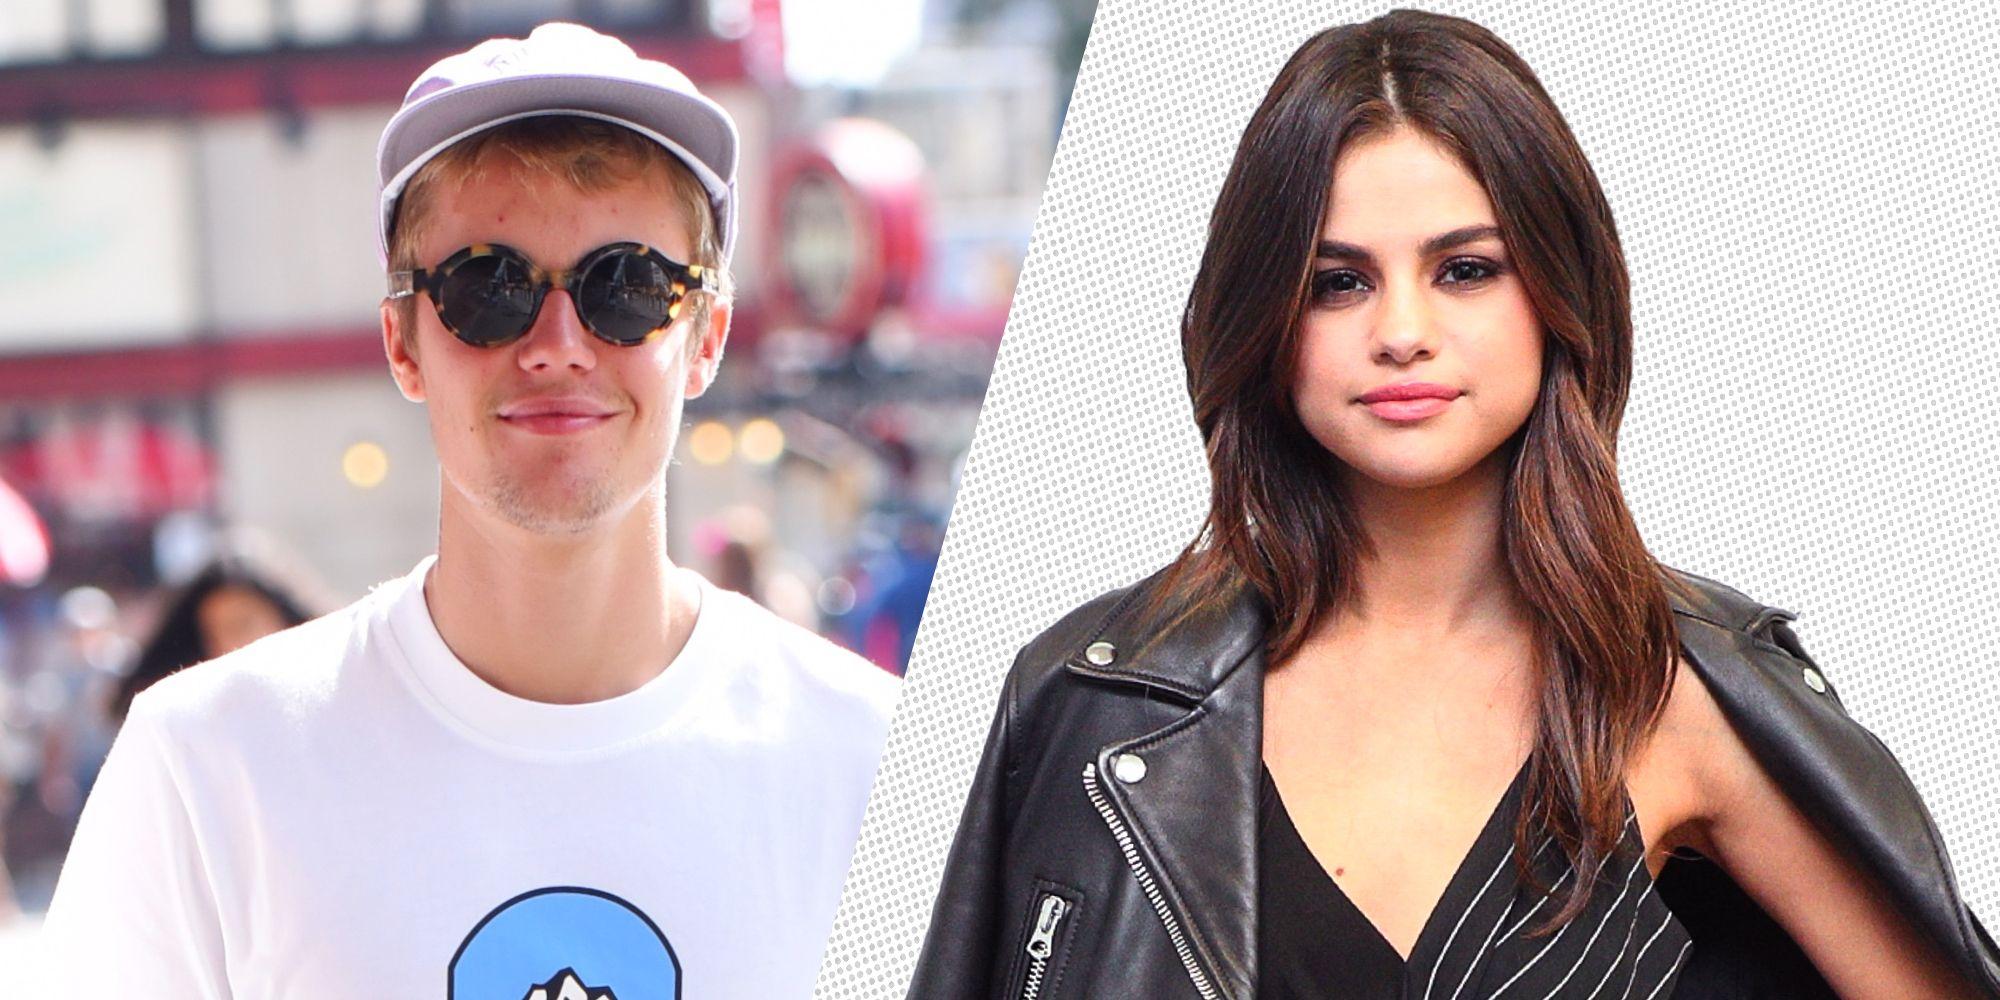 Justin Bieber Friends Lyrics References Selena Gomez - Justin Bieber ...